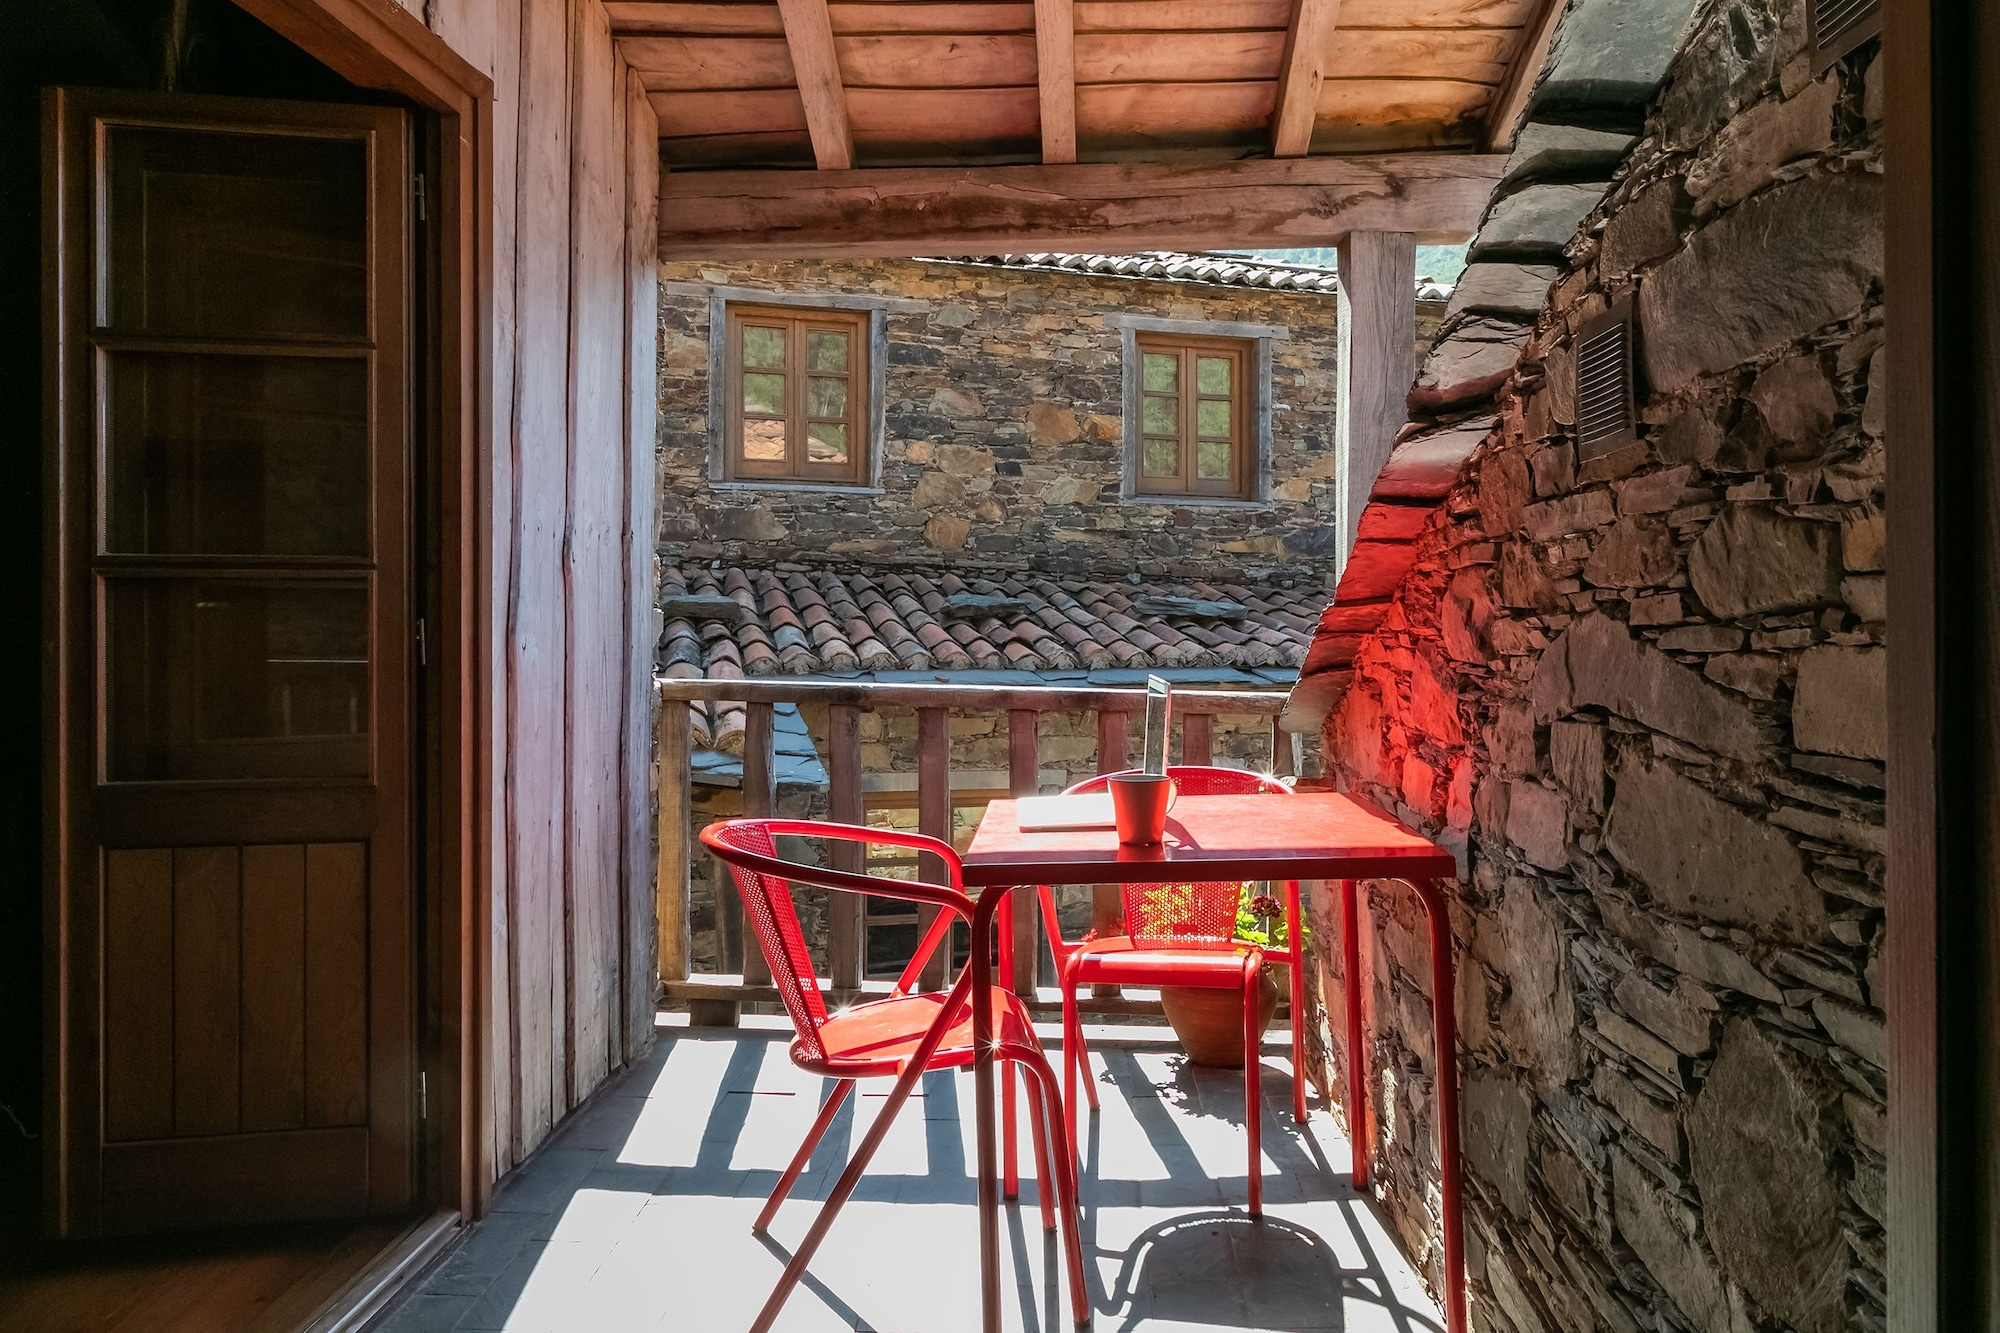 Cerdeira - Home for Creativity, Lousã